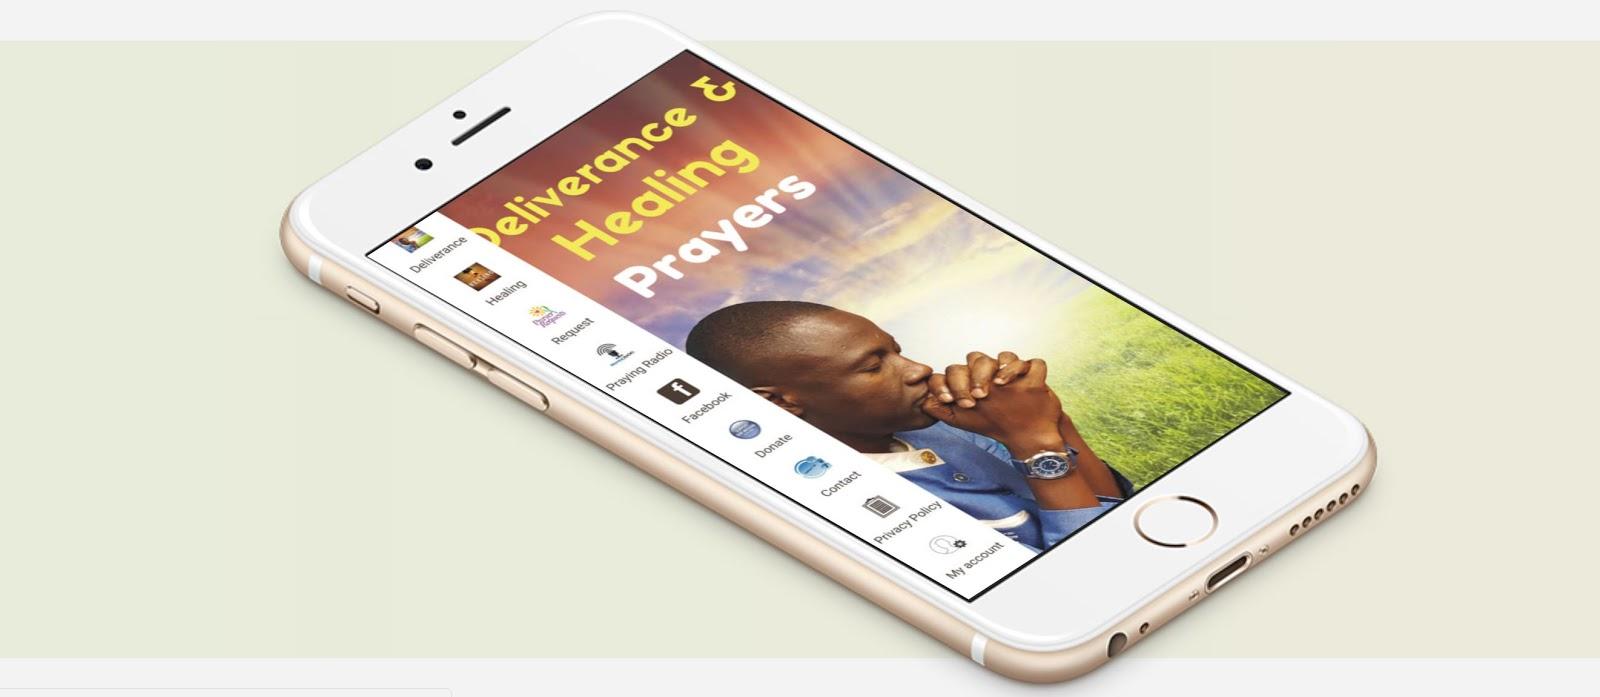 PRAYER PLATFORM: PREVAILING PRAYERS AGAINST STUBBORN CHALLENGES